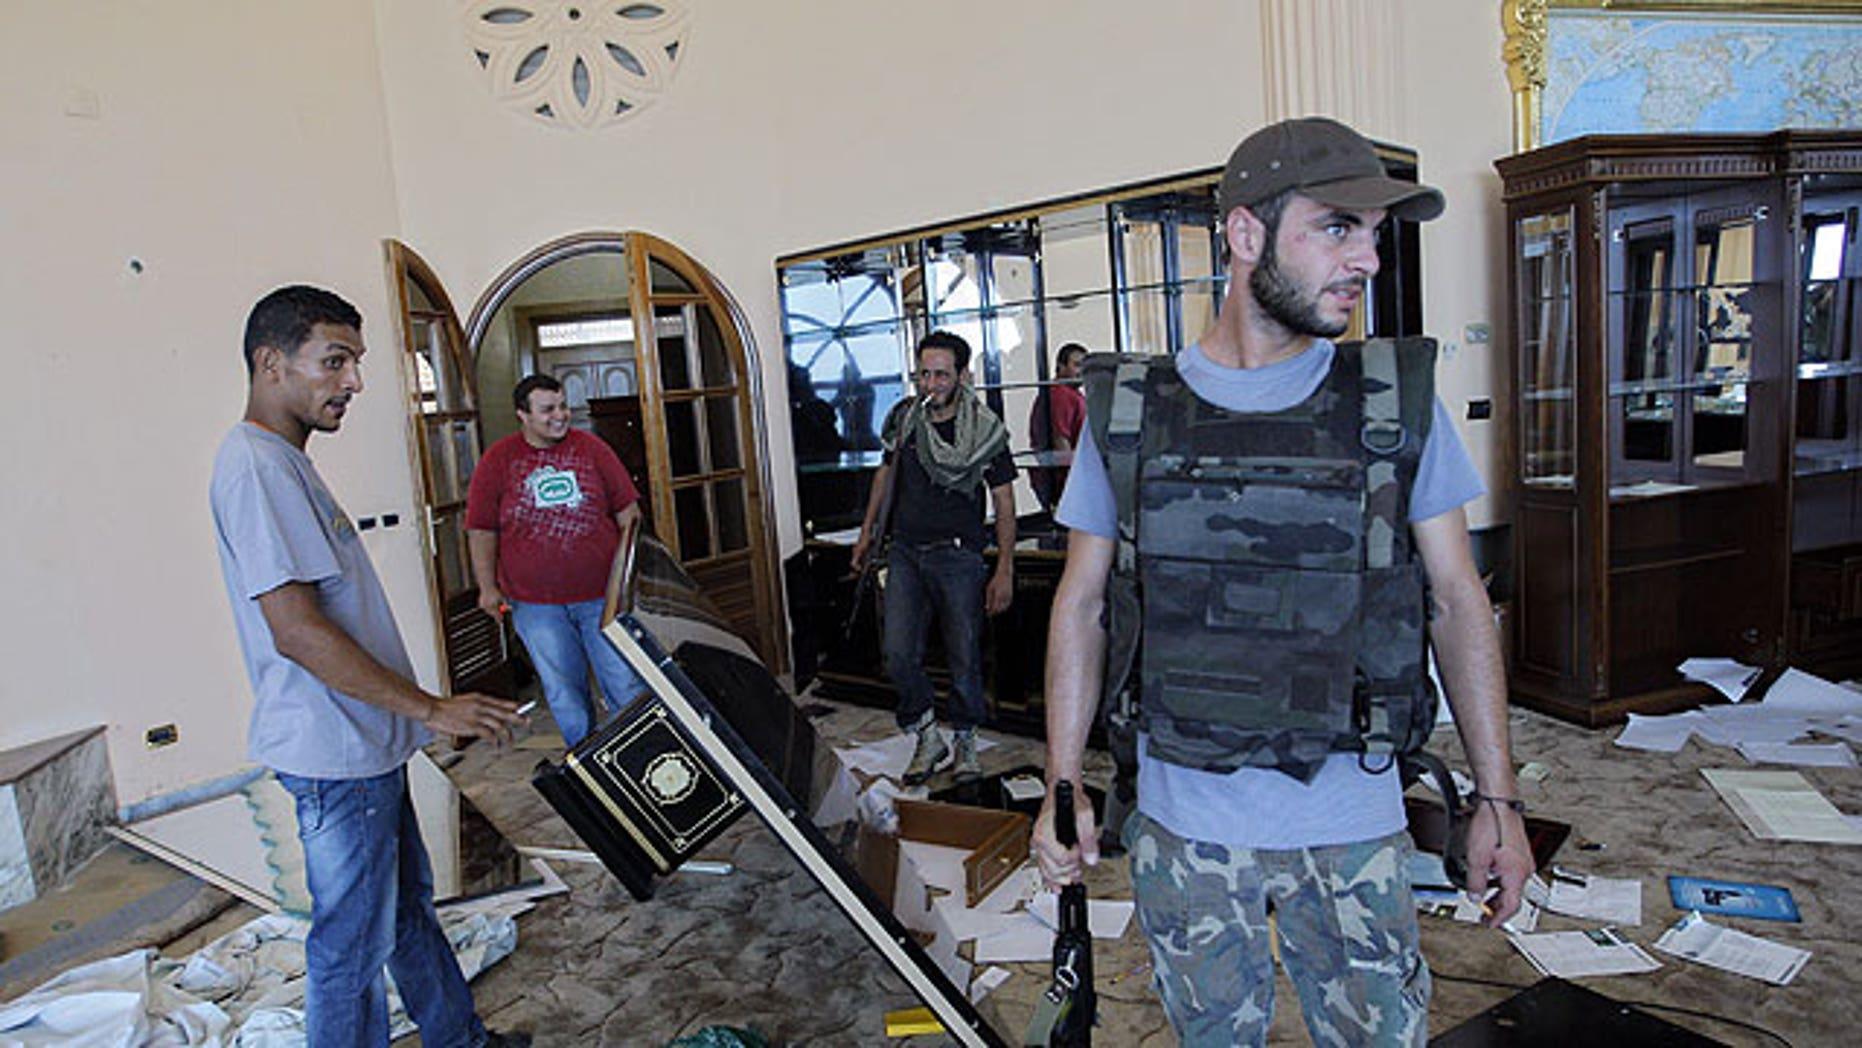 August 24: A rebel fighter walks inside the house of Al-Saadi Qaddafi, the son of Libyan dictator Muammar Qaddafi in Tripoli, Libya,